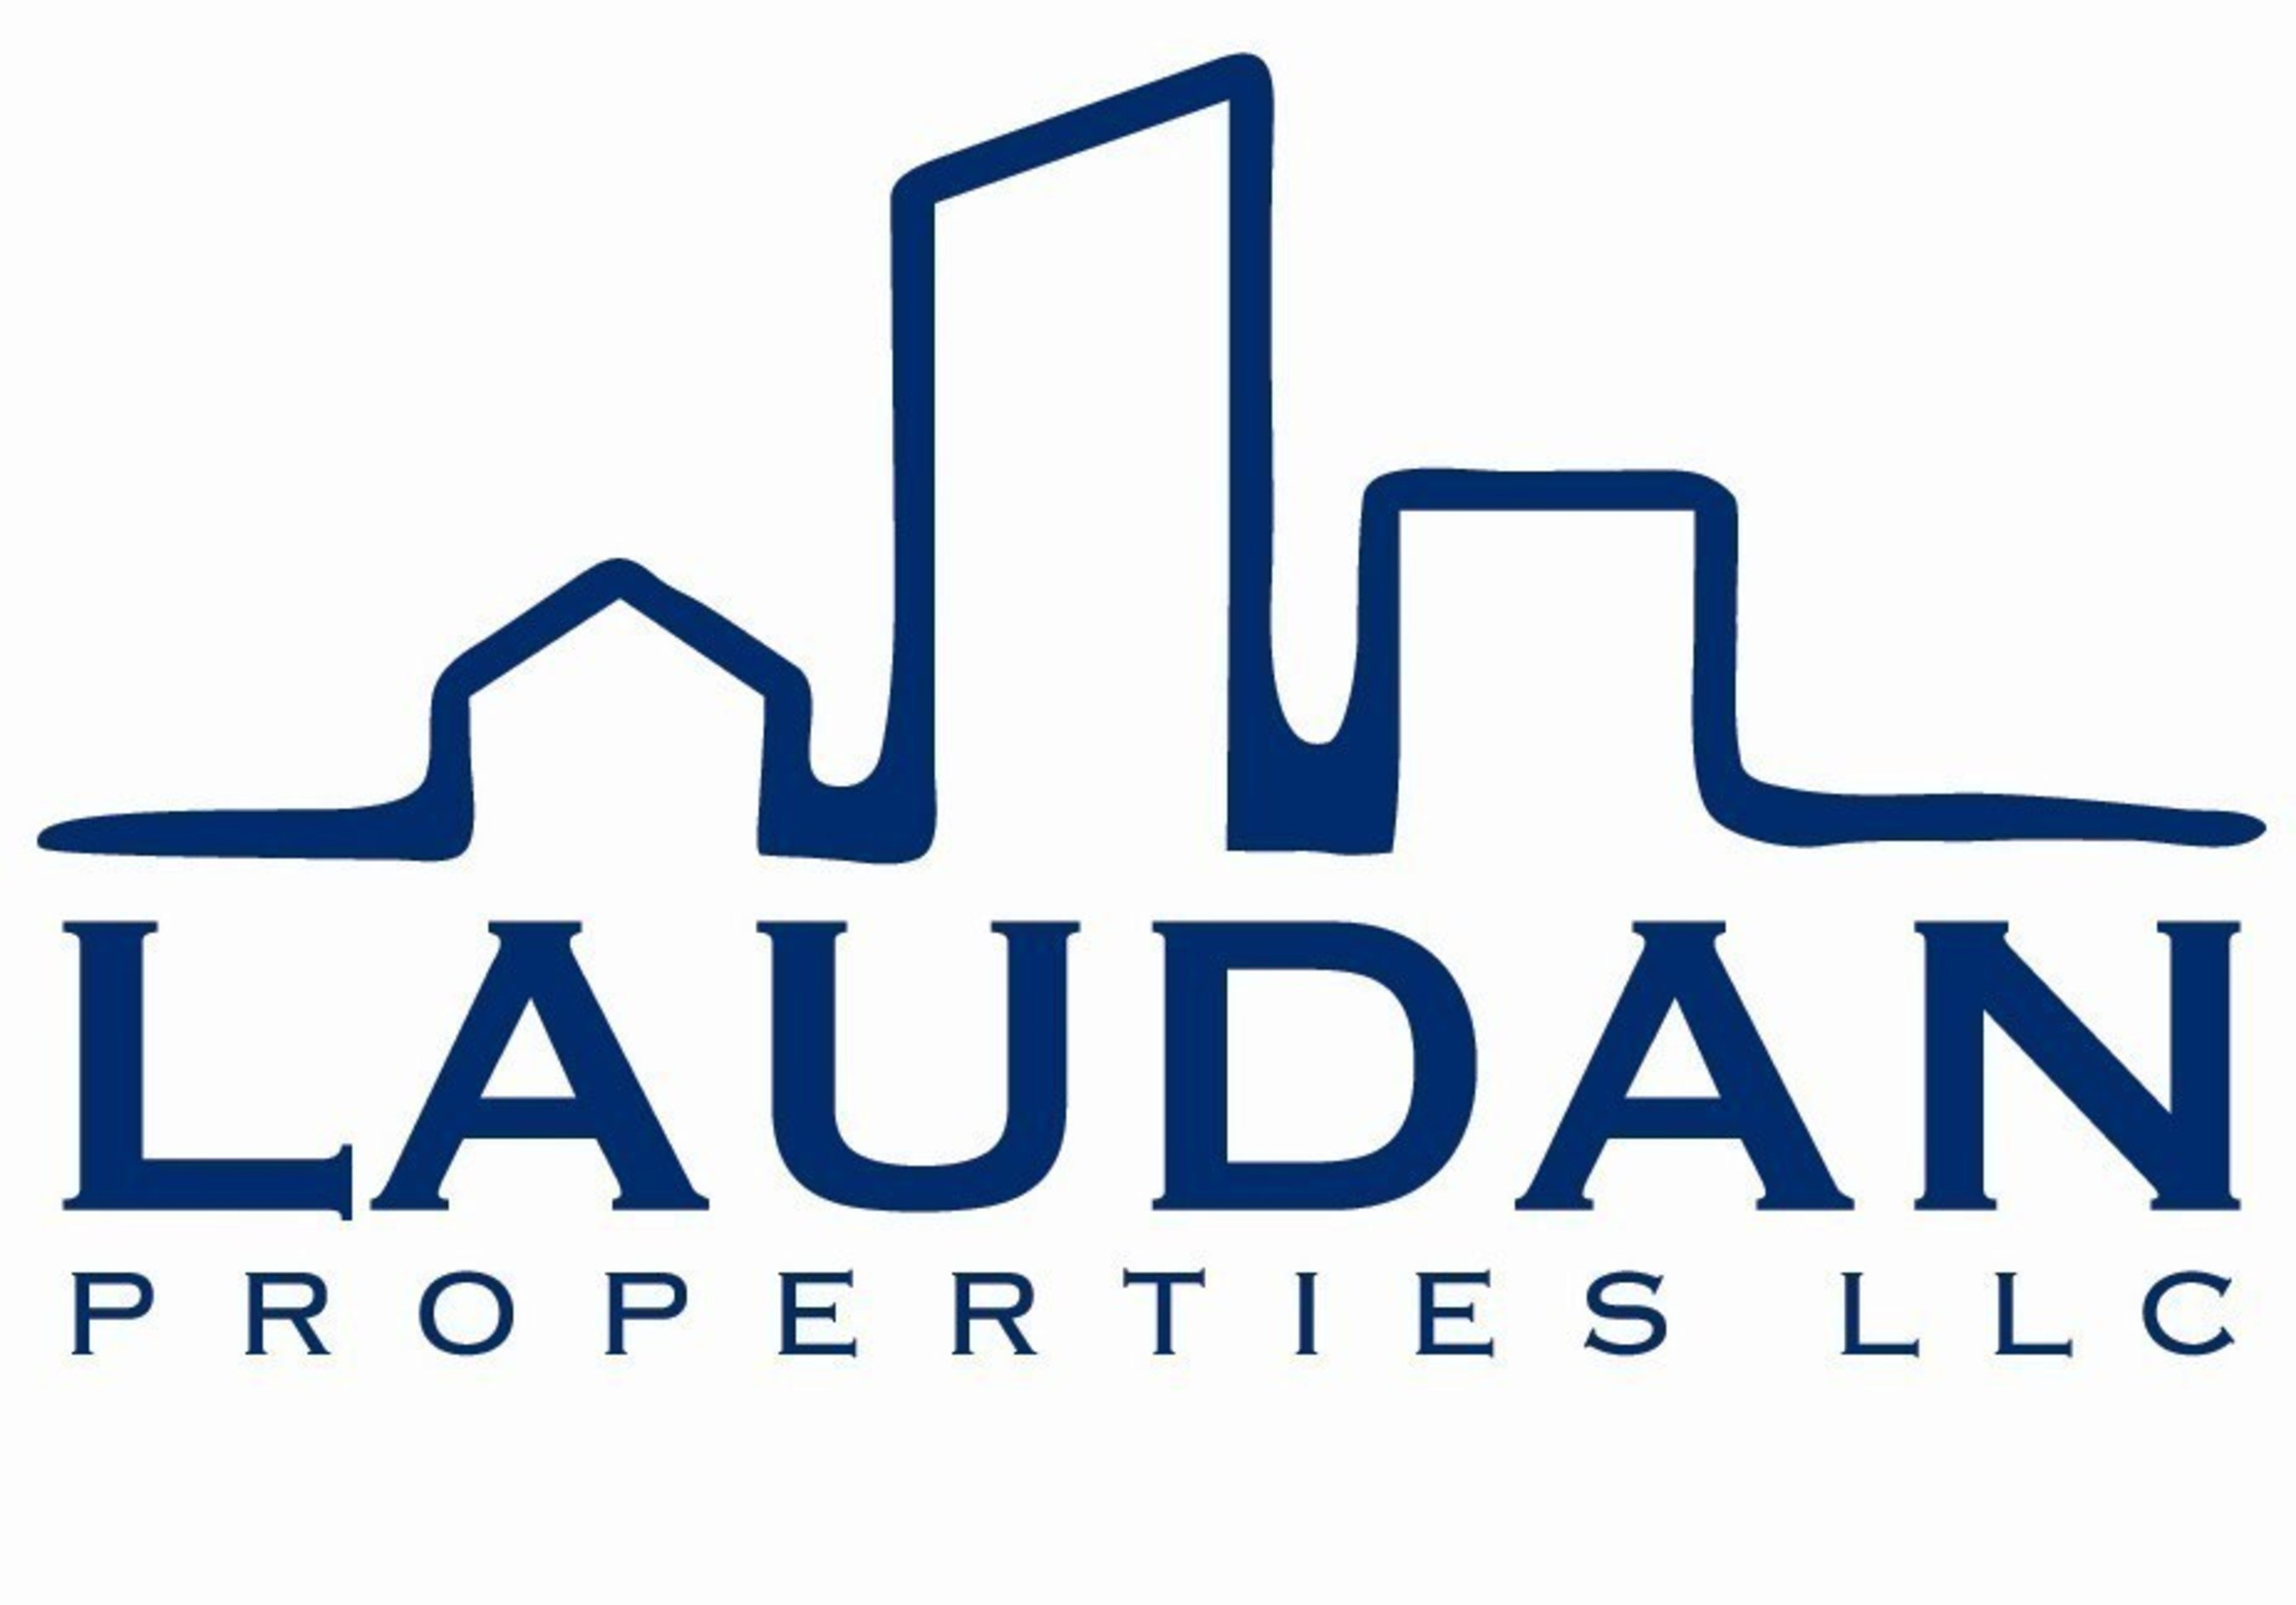 LAUDAN PROPERTIES LANDS TOP PERFOMER TO LEAD BUSINESS DEVELOPMENT EFFORTS